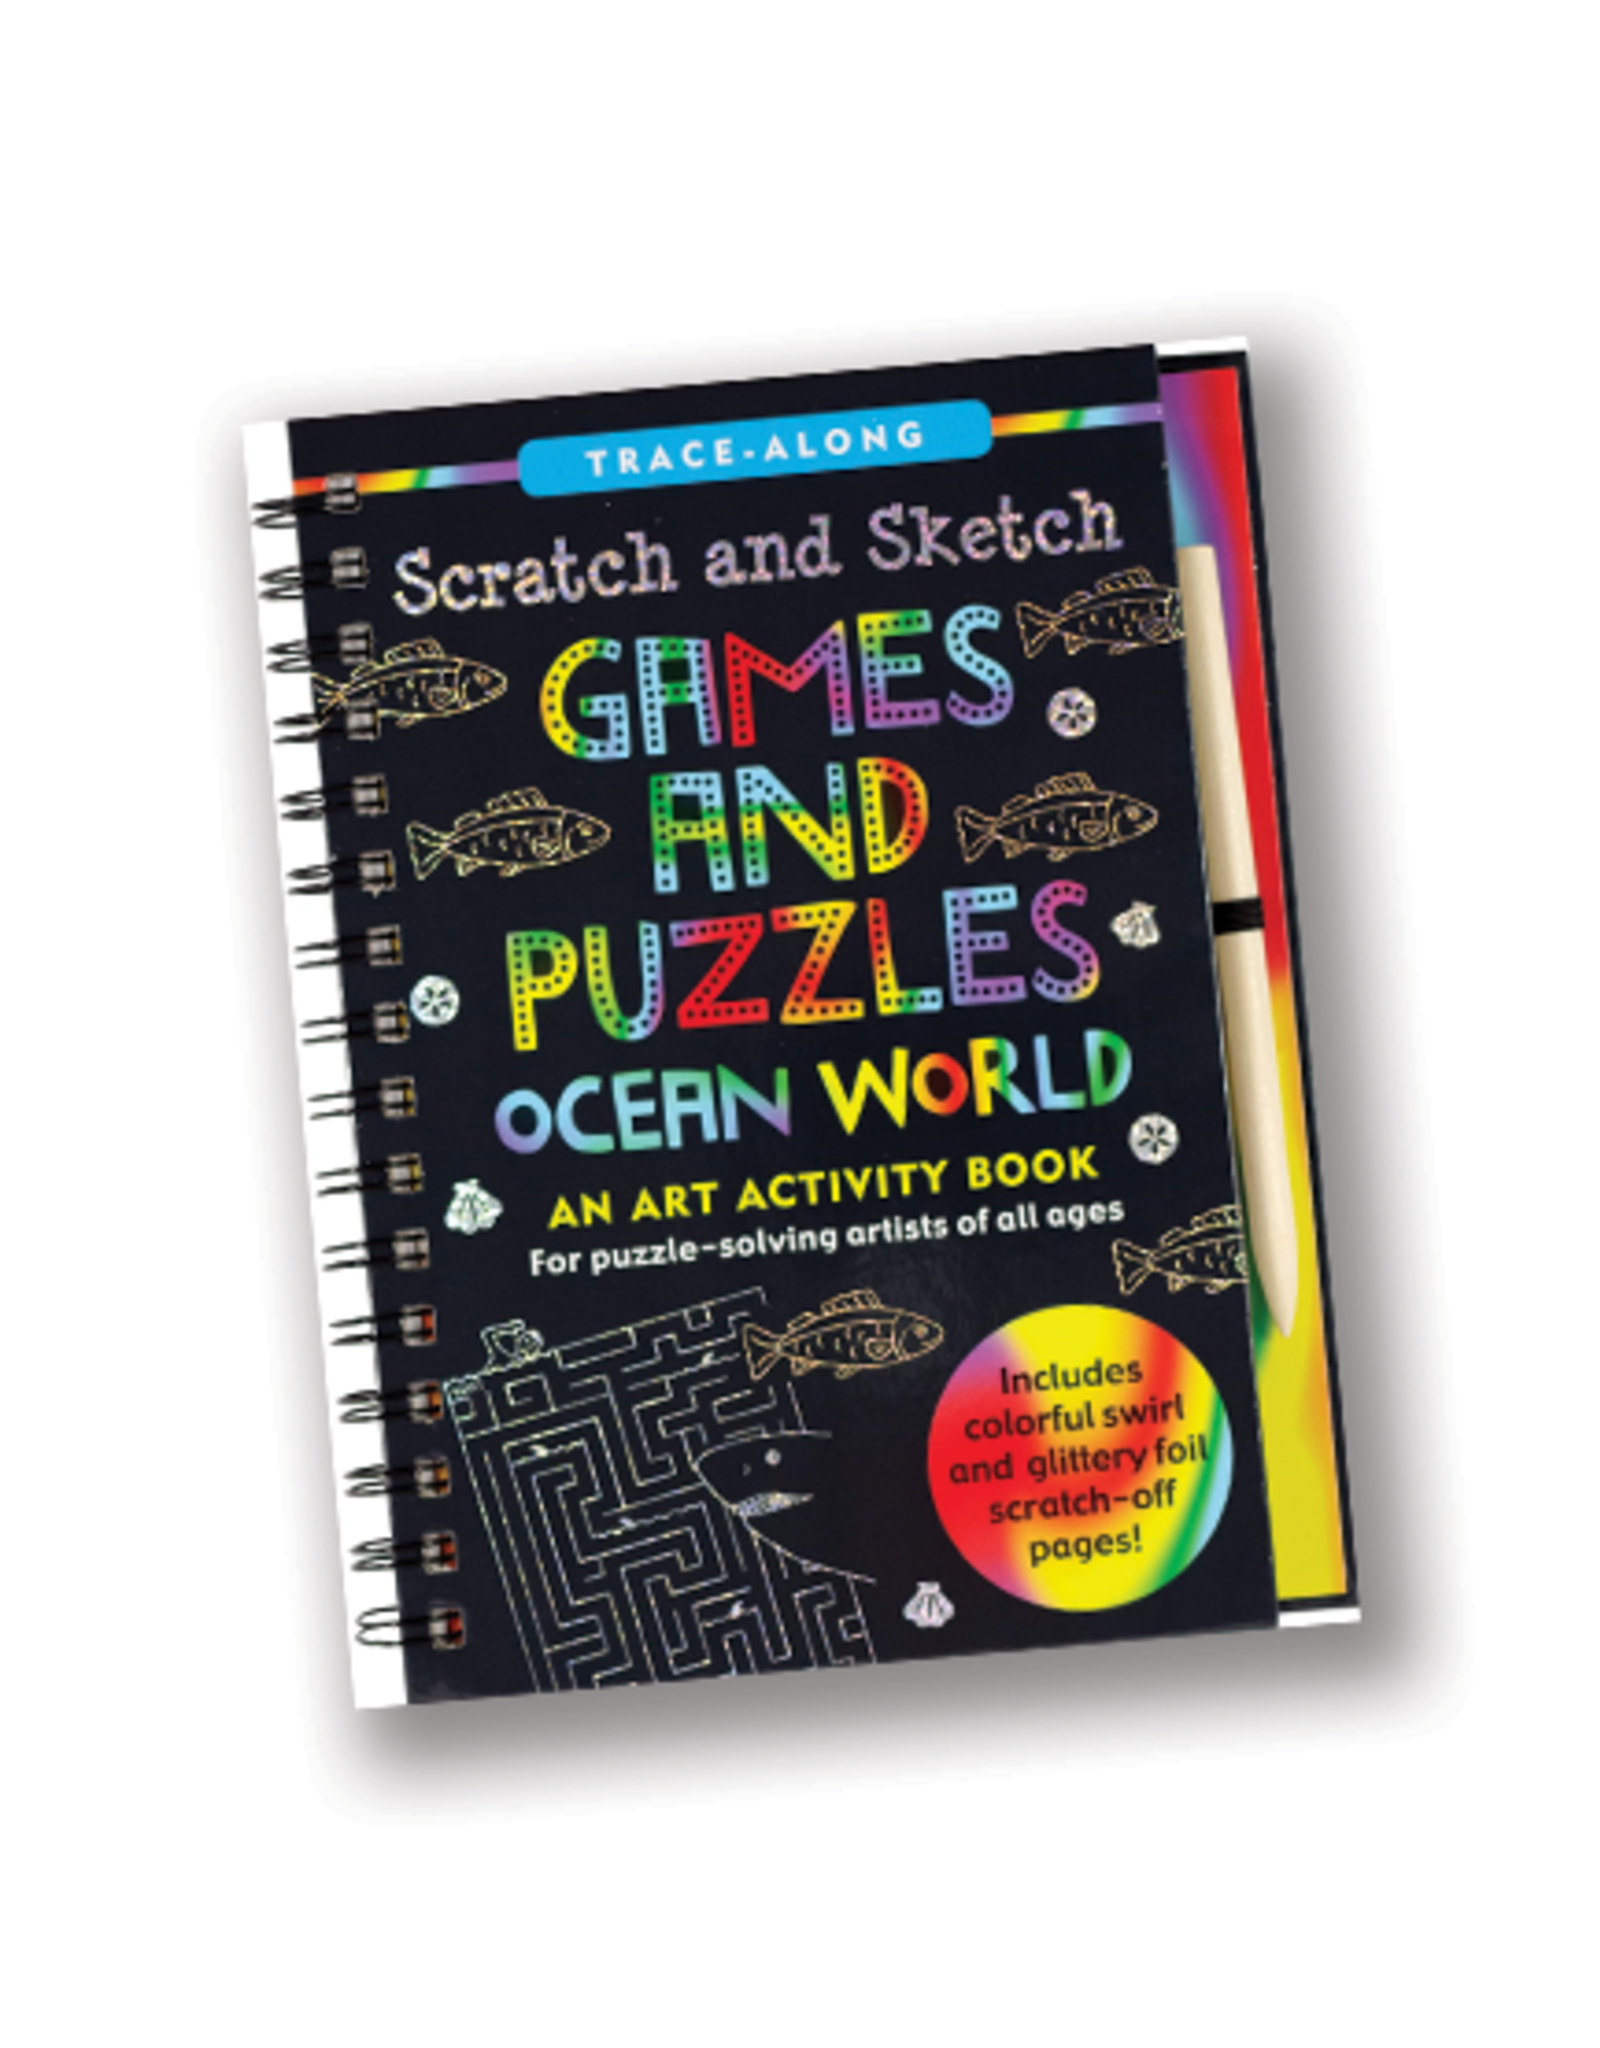 Ocean World Games & Puzzles Scratch & Sketch